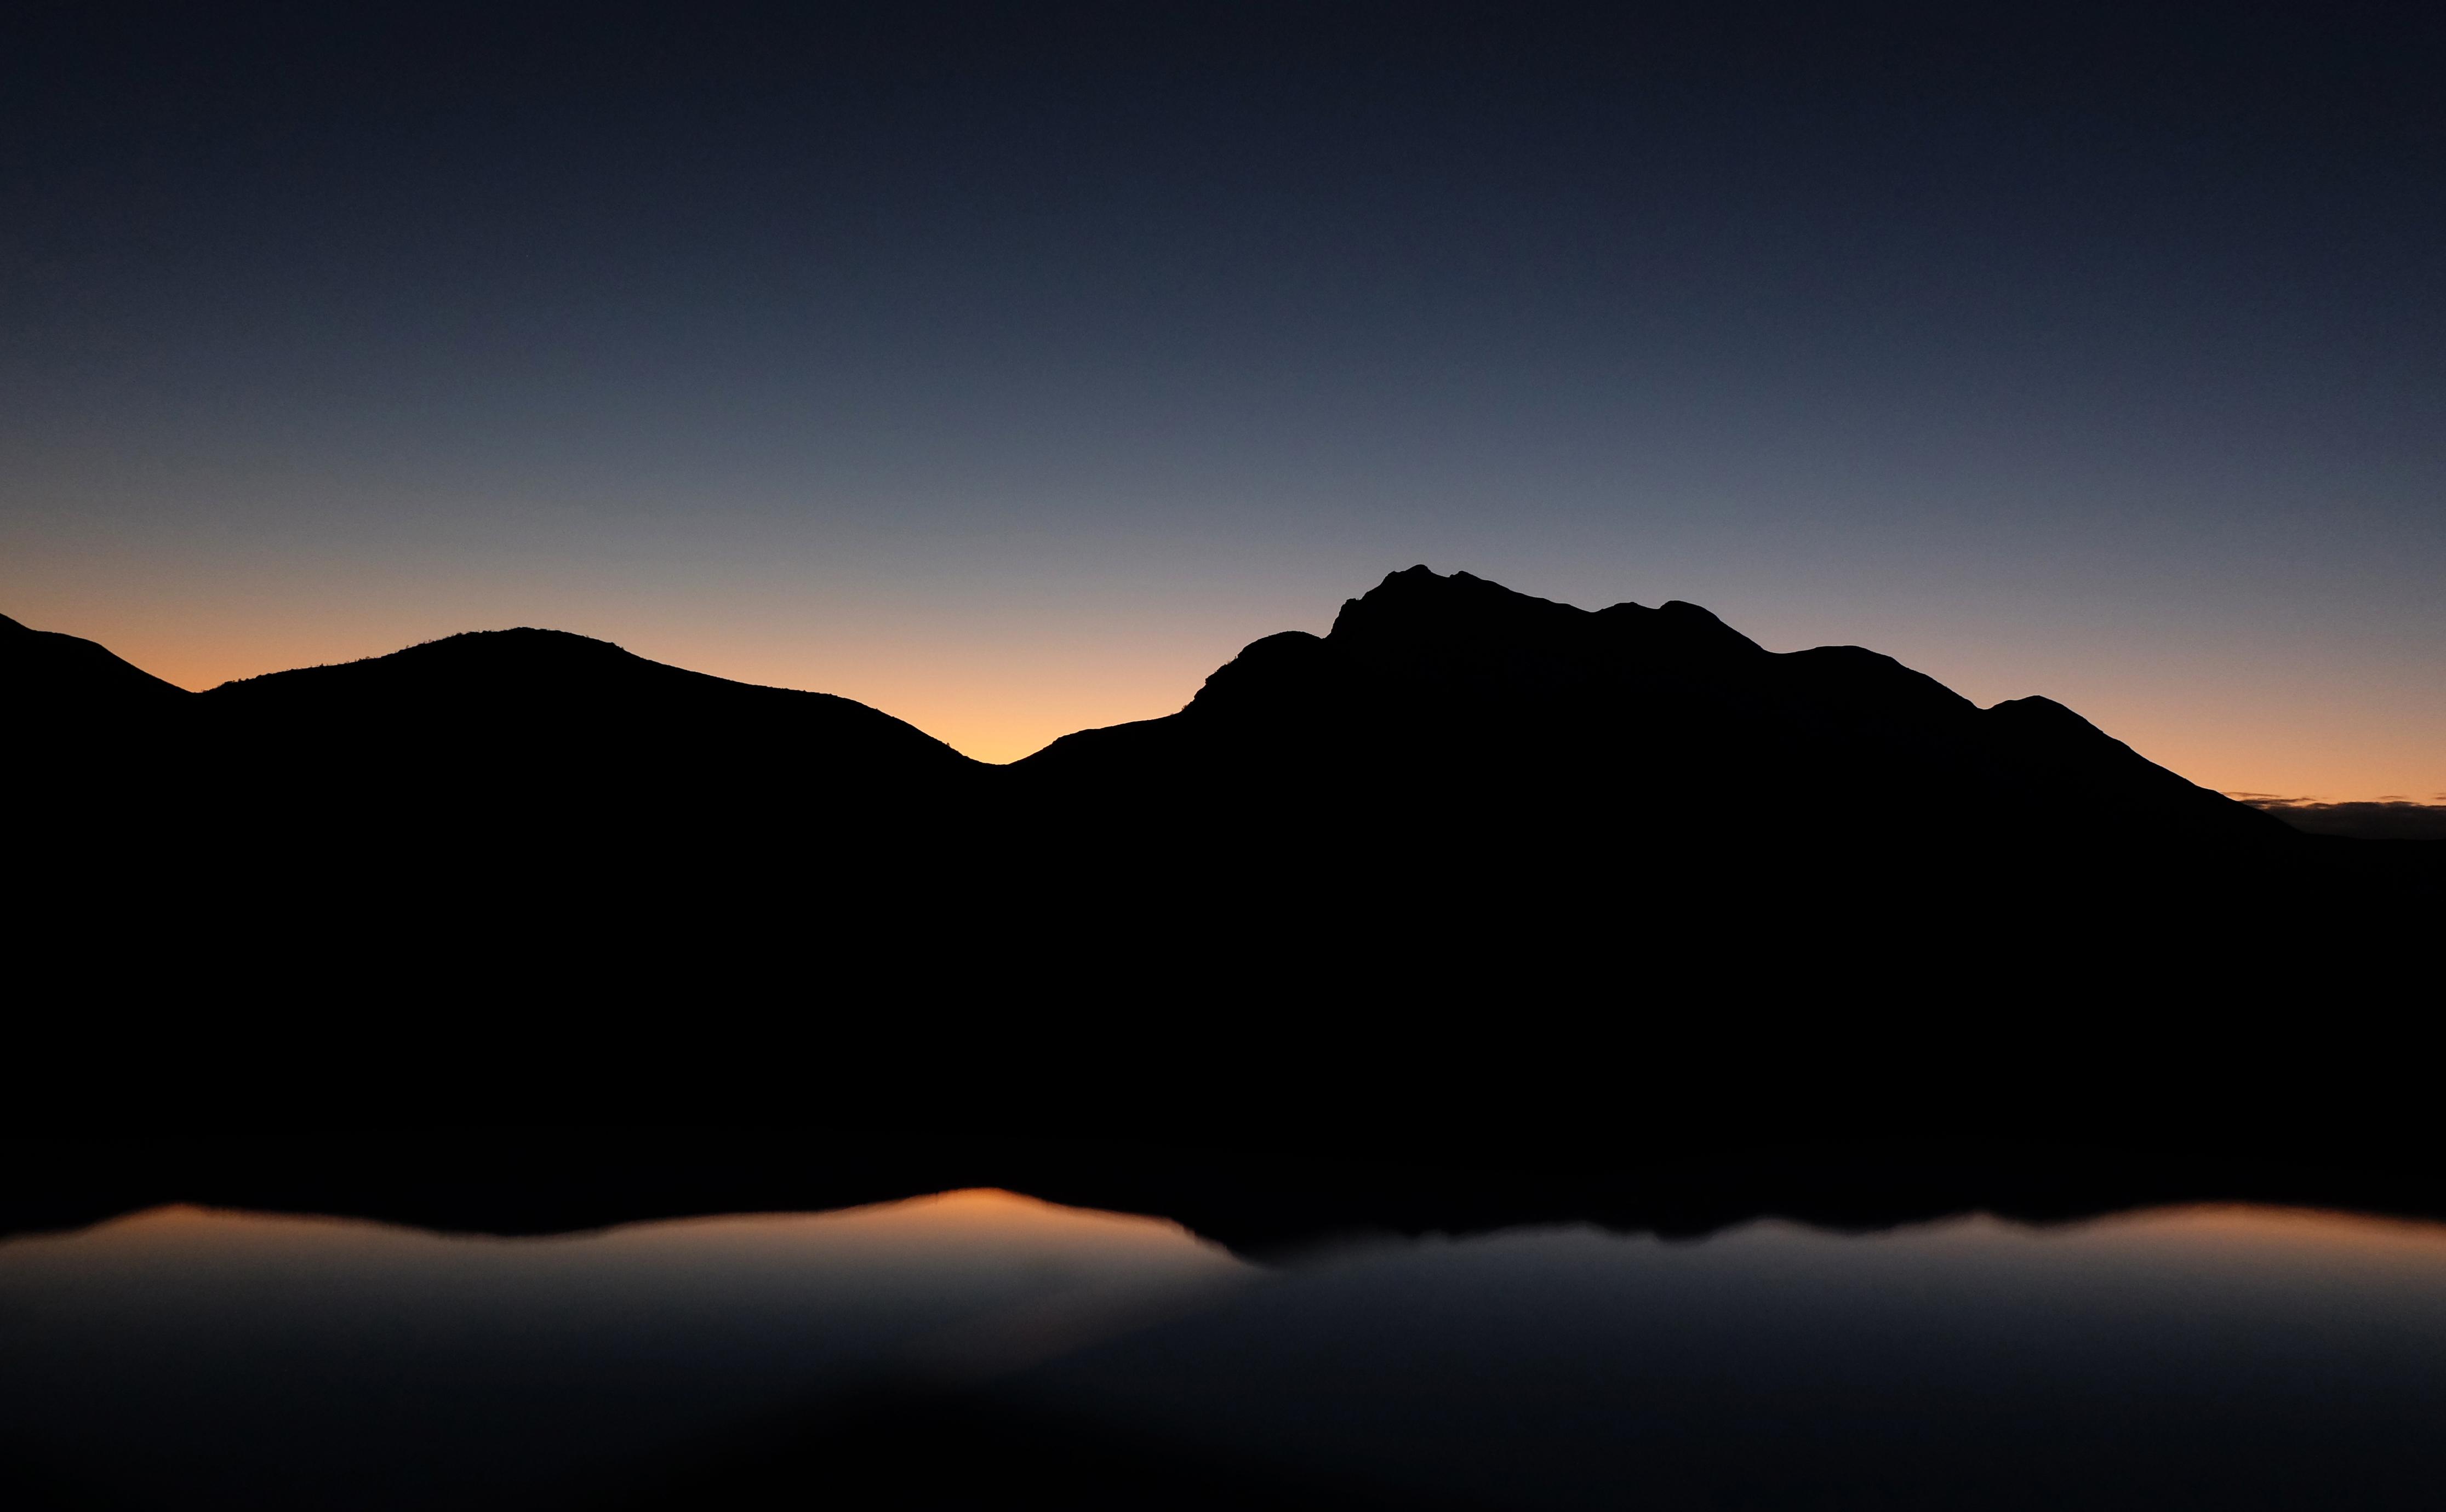 wallpaper mountains dark sunset night hill